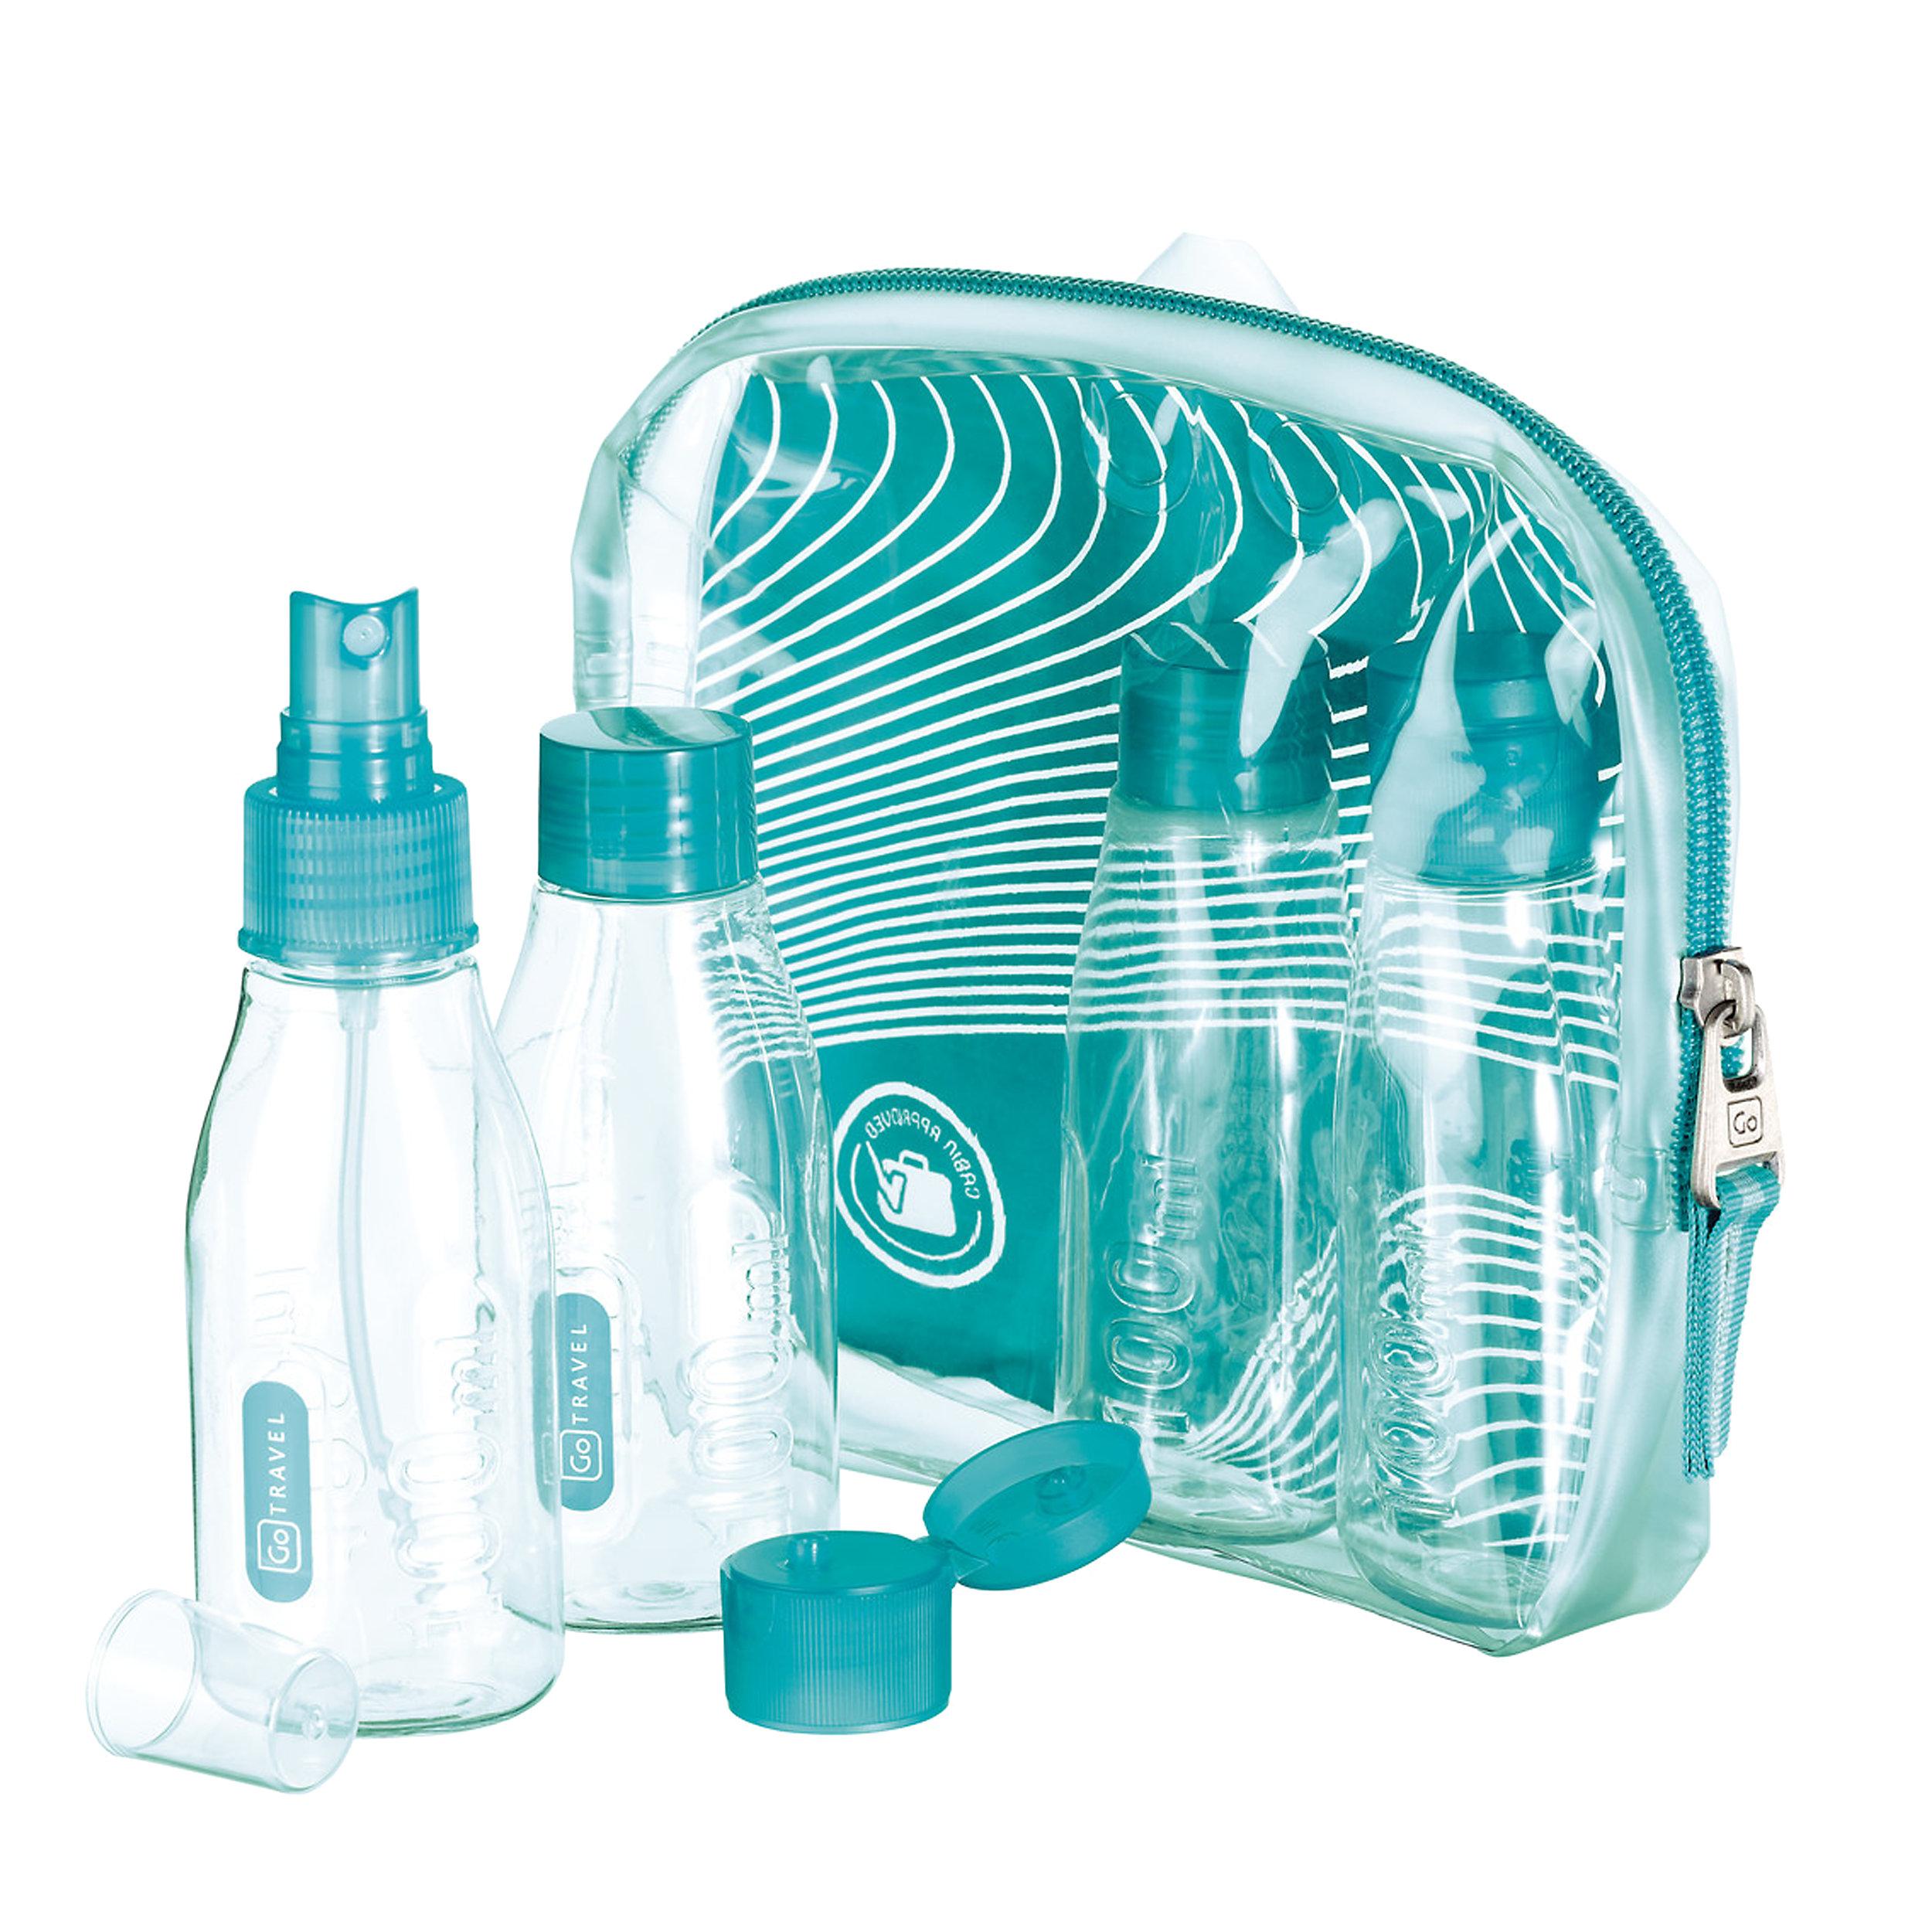 4-tlg. Kabinenflaschen-Set